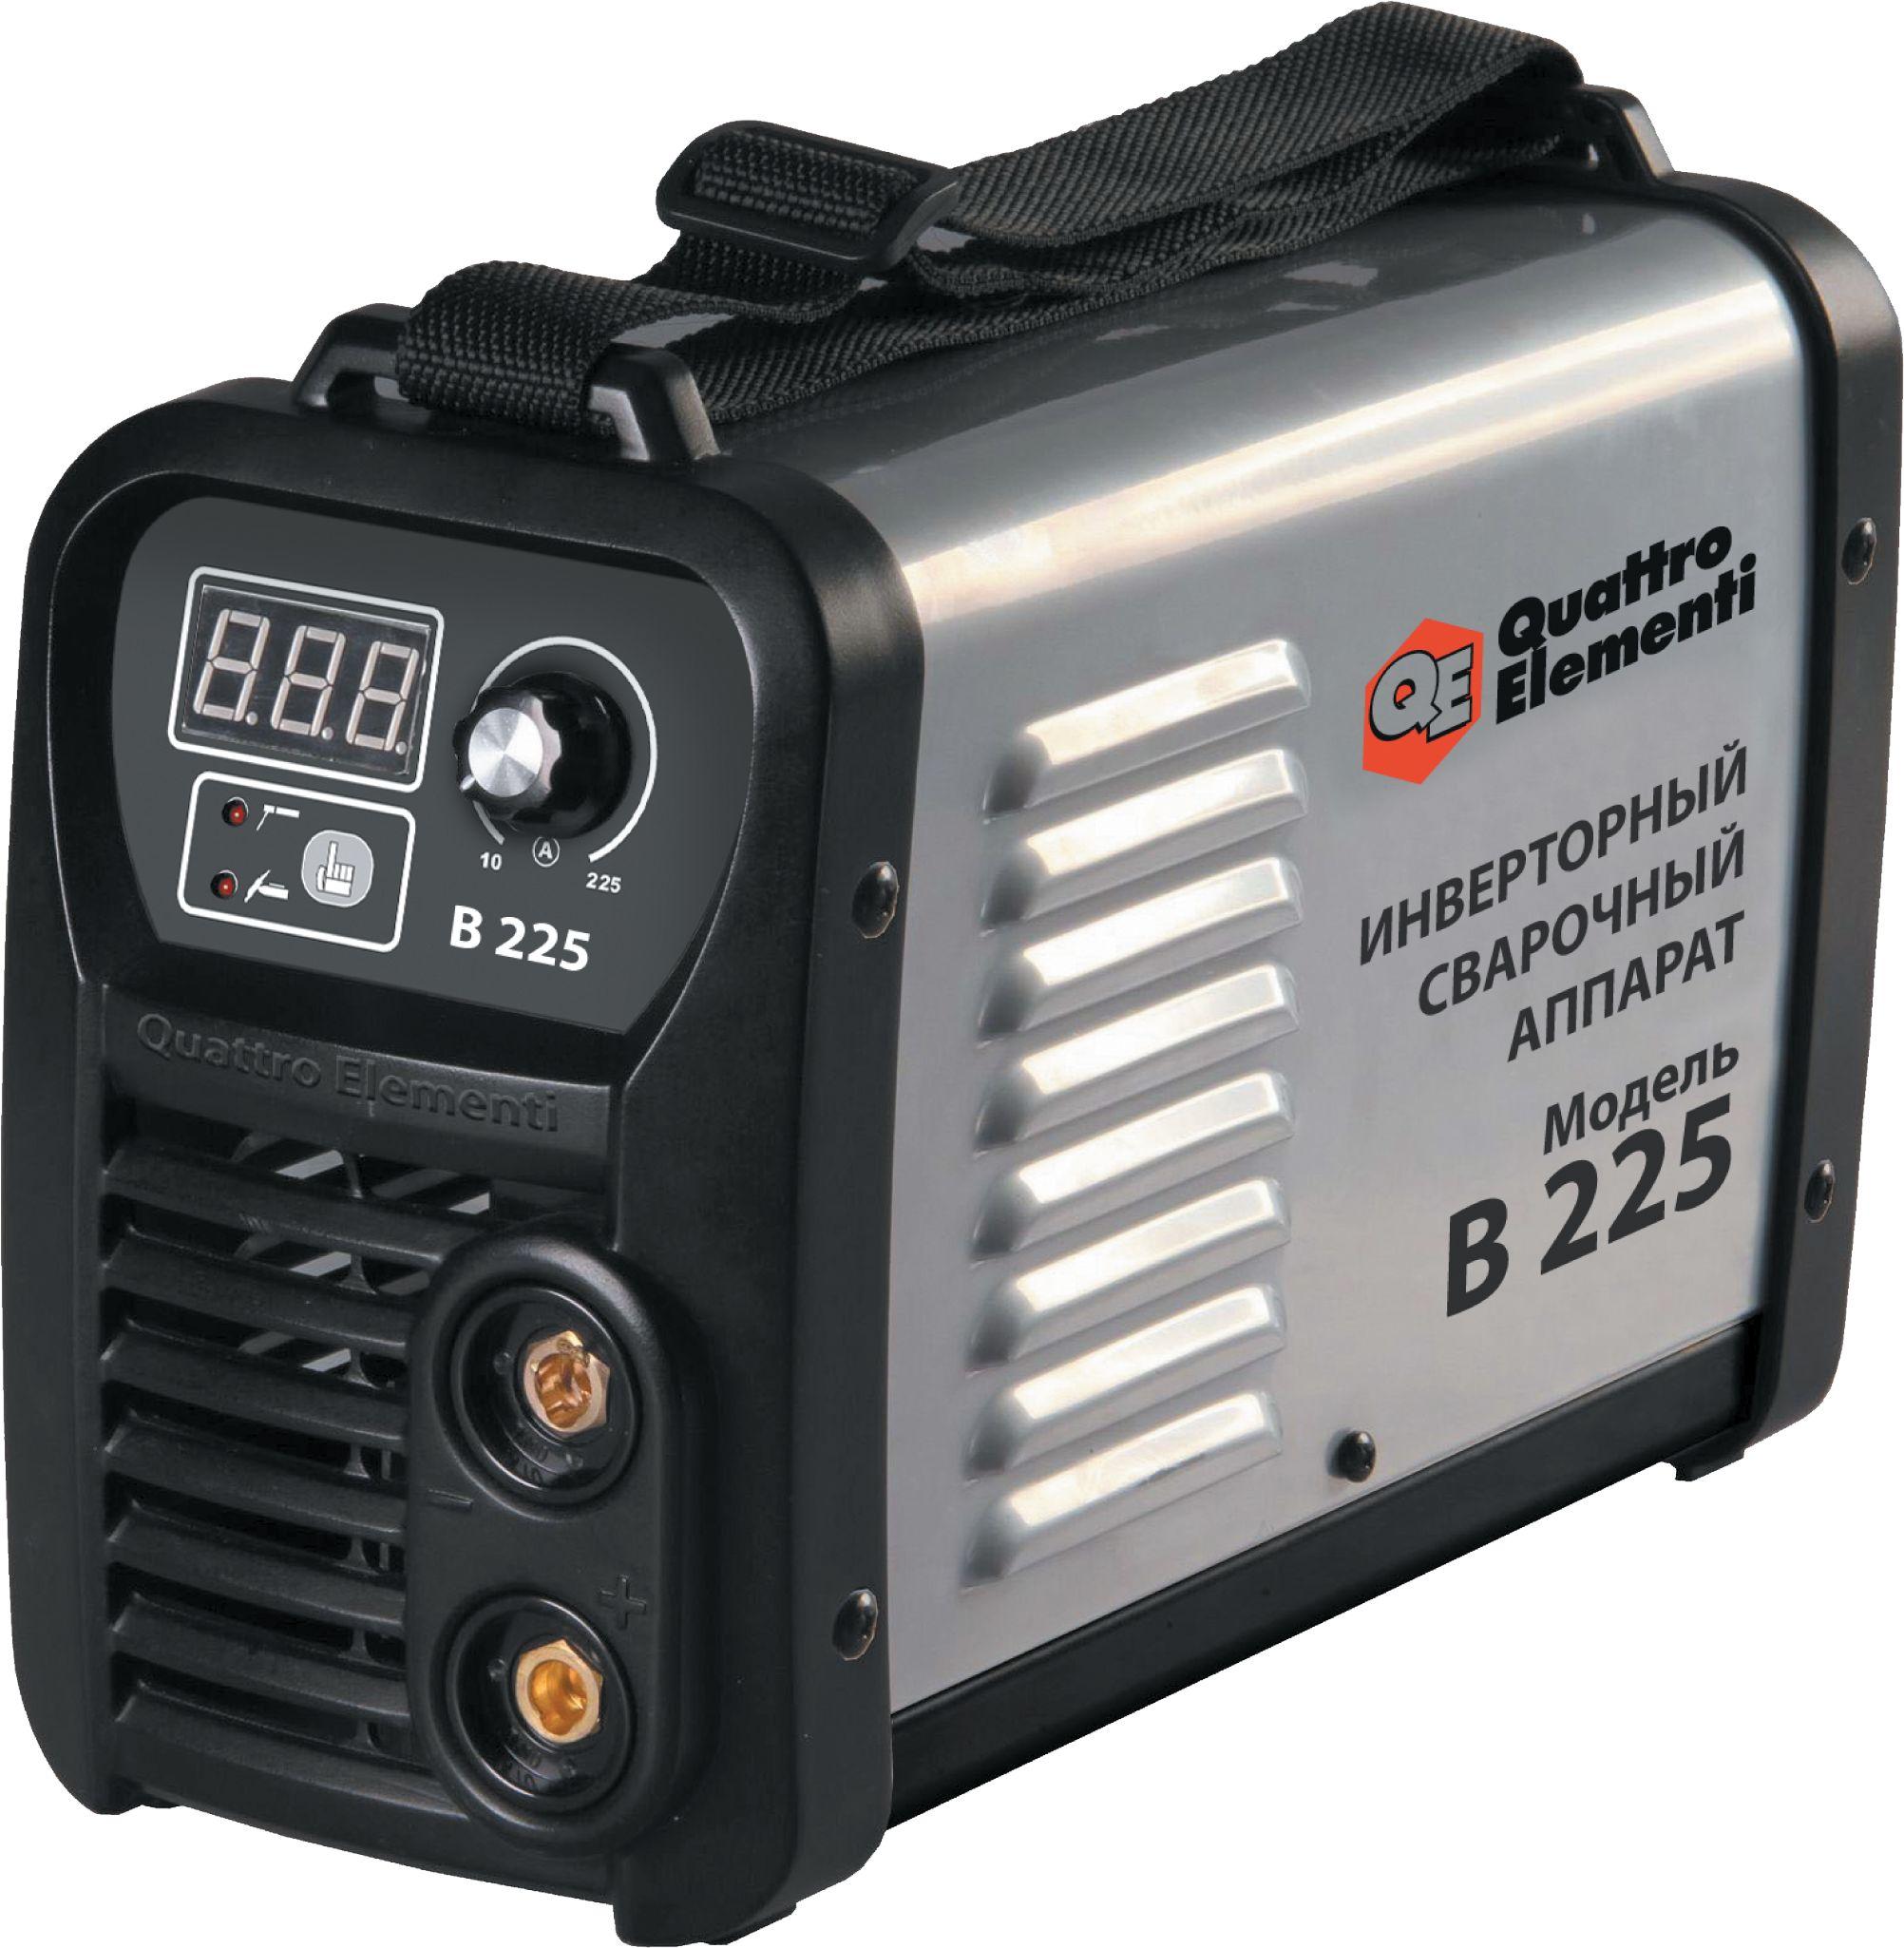 Сварочный аппарат Quattro elementi Qe В225